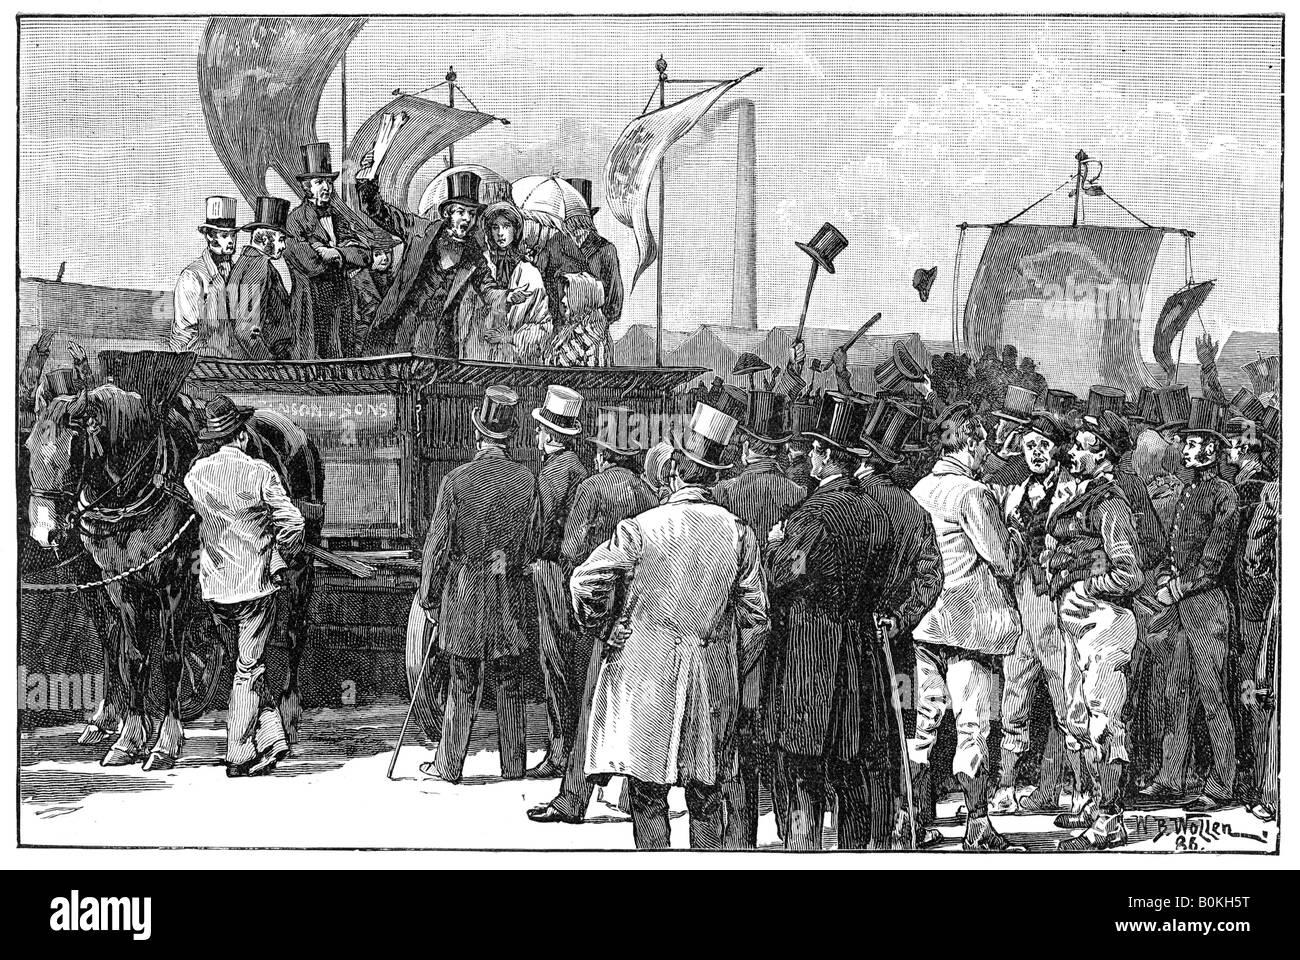 trade unions 19th century